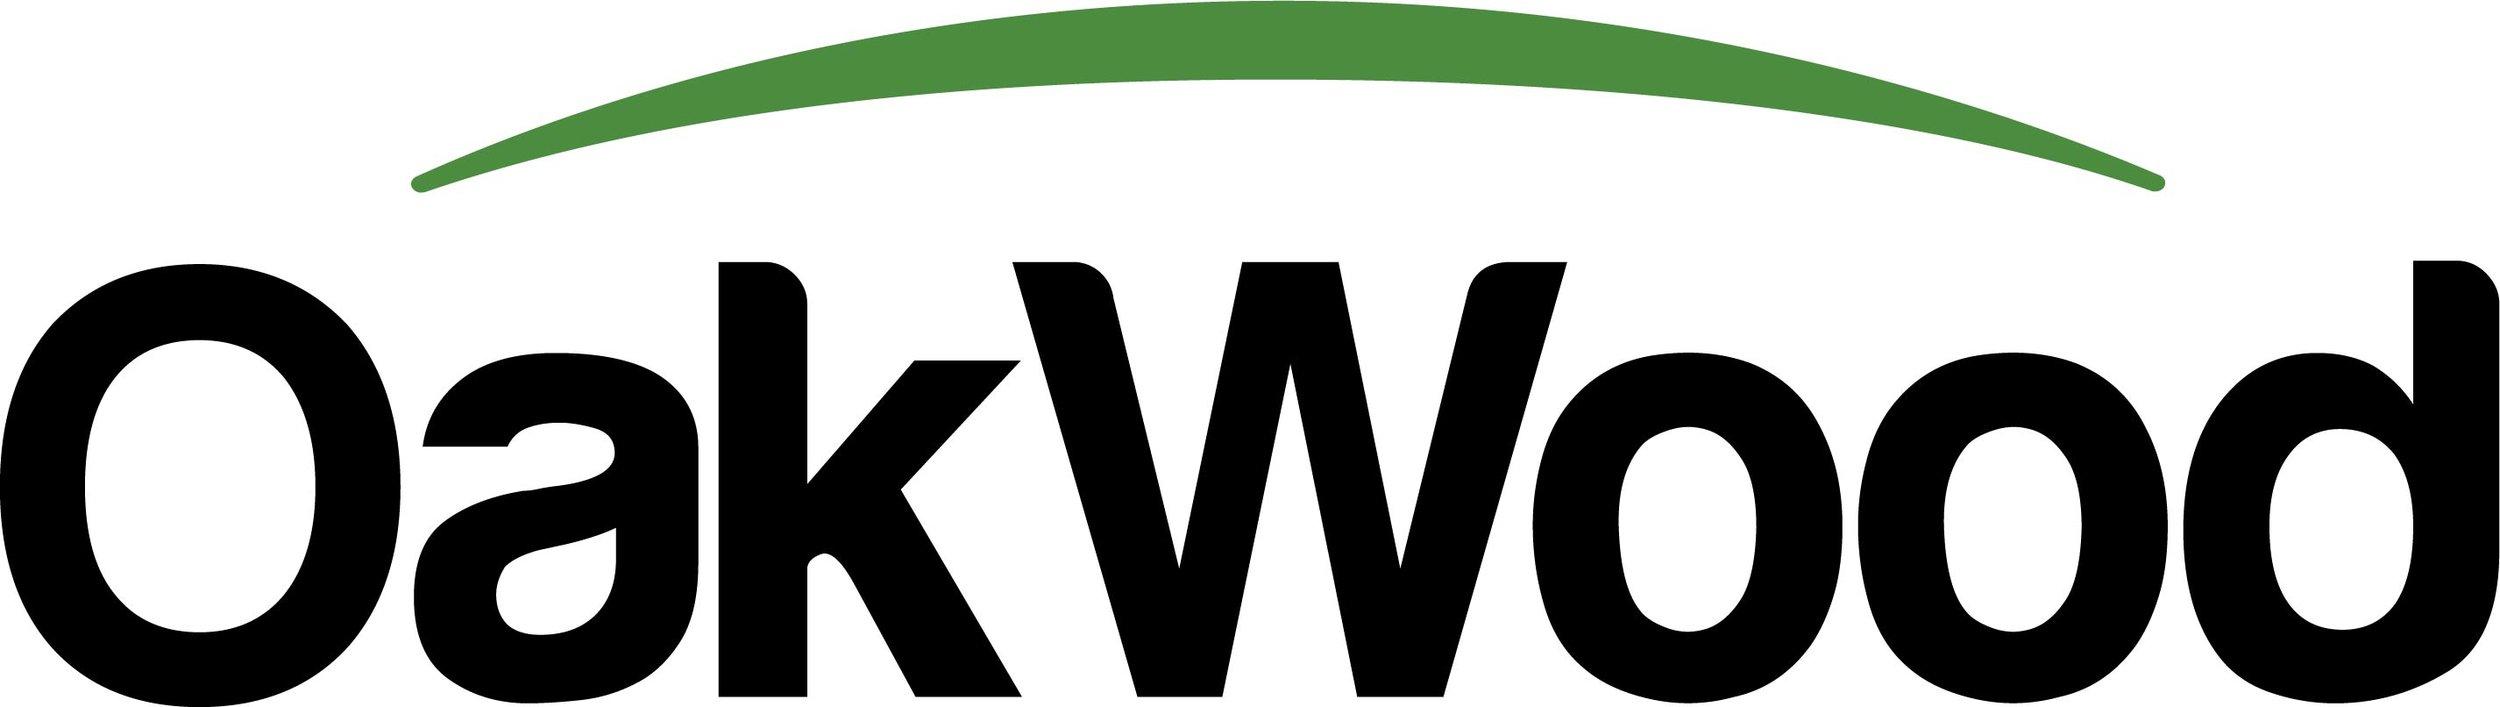 OakWood logo.jpg